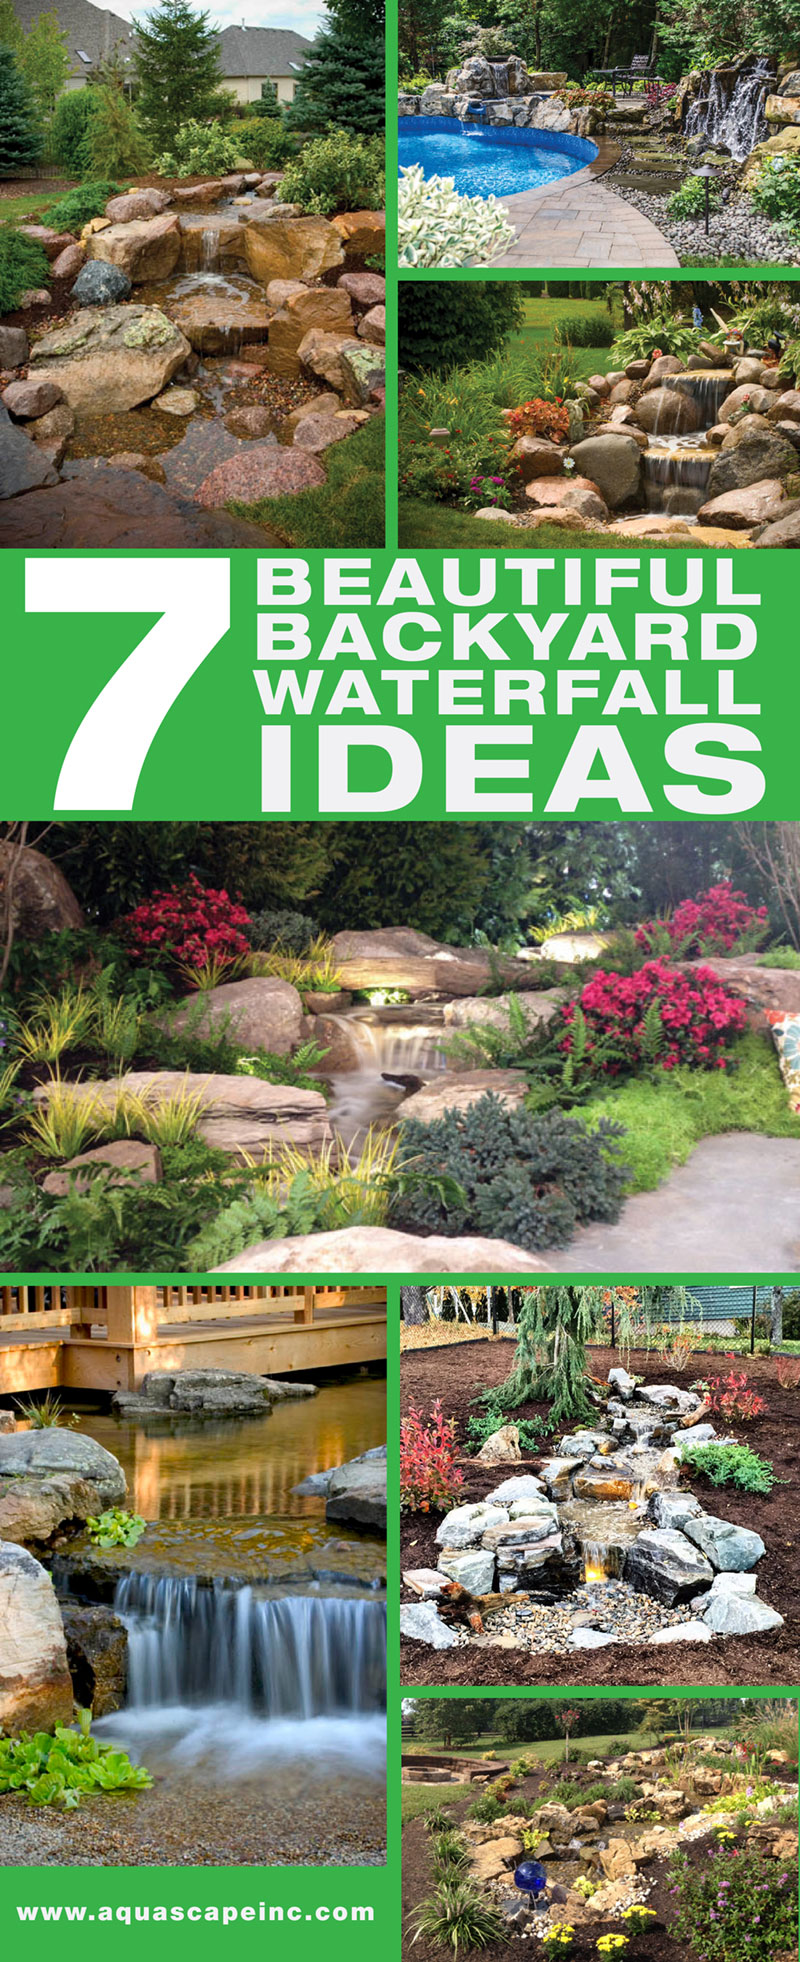 Teal Backyard Waterfall Ideas Backyard Waterfall Ideas Backyard Garden Images Backyard Garden Ideas outdoor Beautiful Backyard Garden